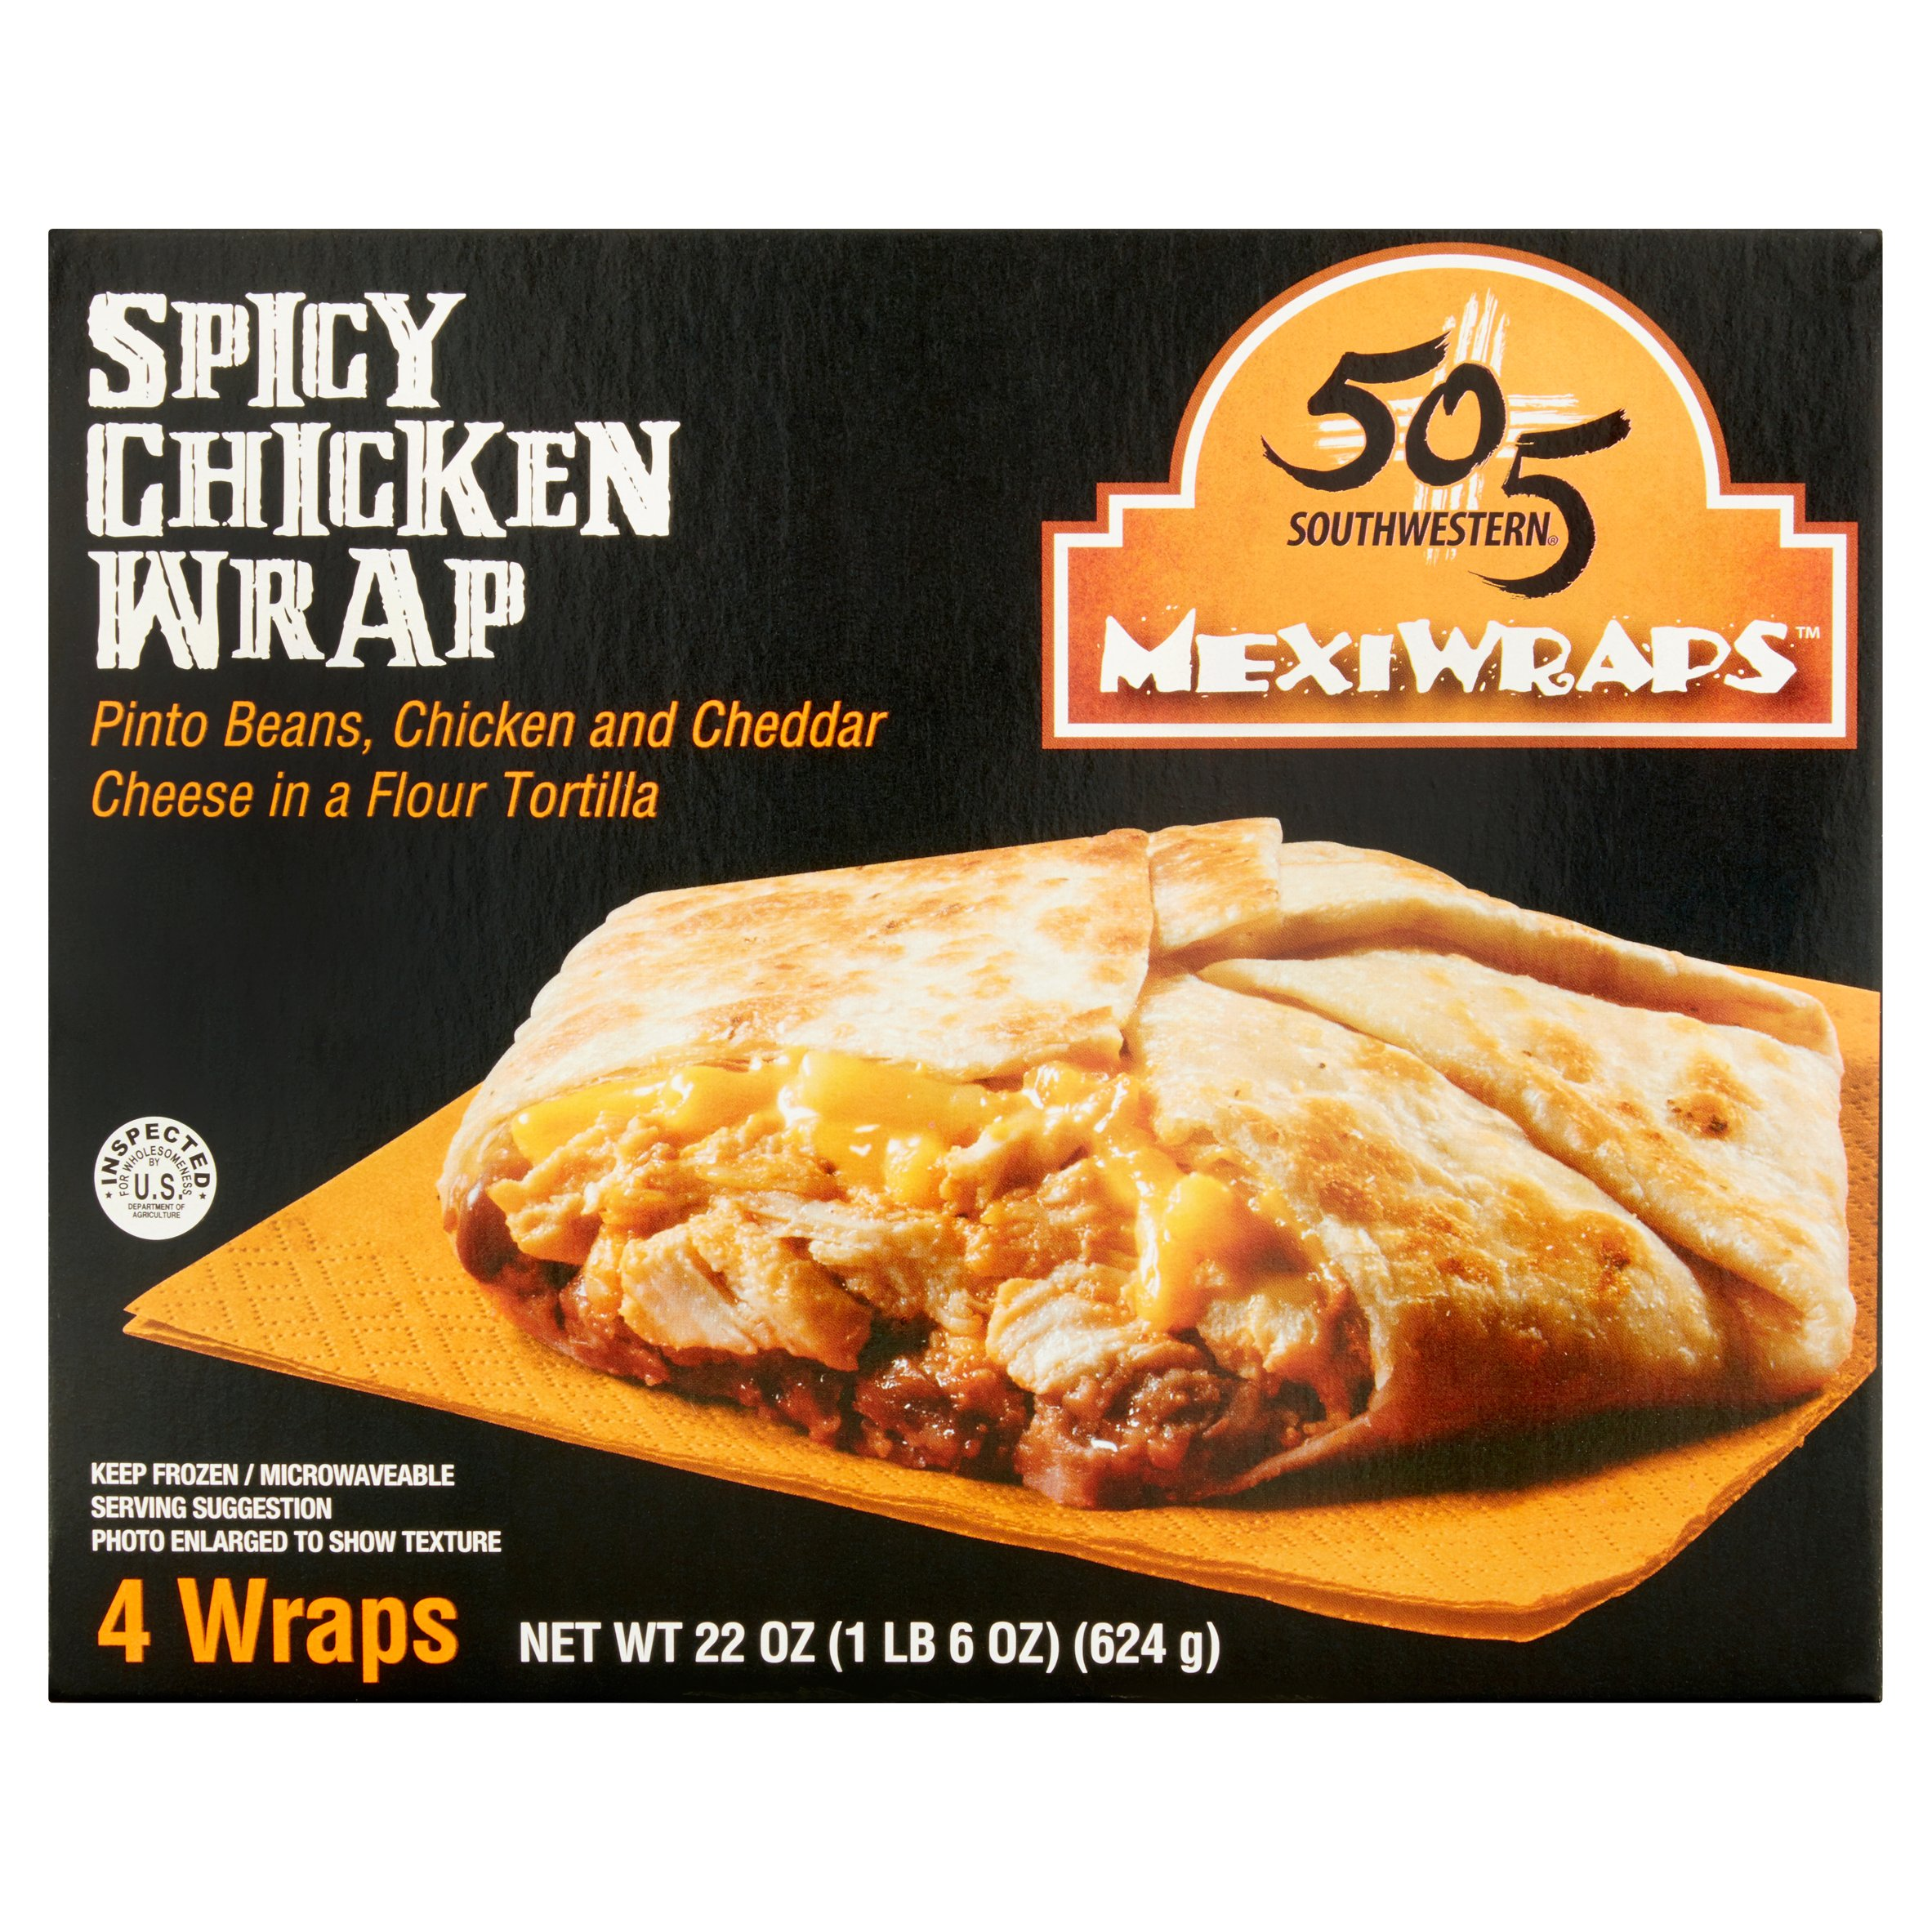 505 Southwestern MexiWraps Spicy Chicken Wrap, 4 count, 5.5, oz